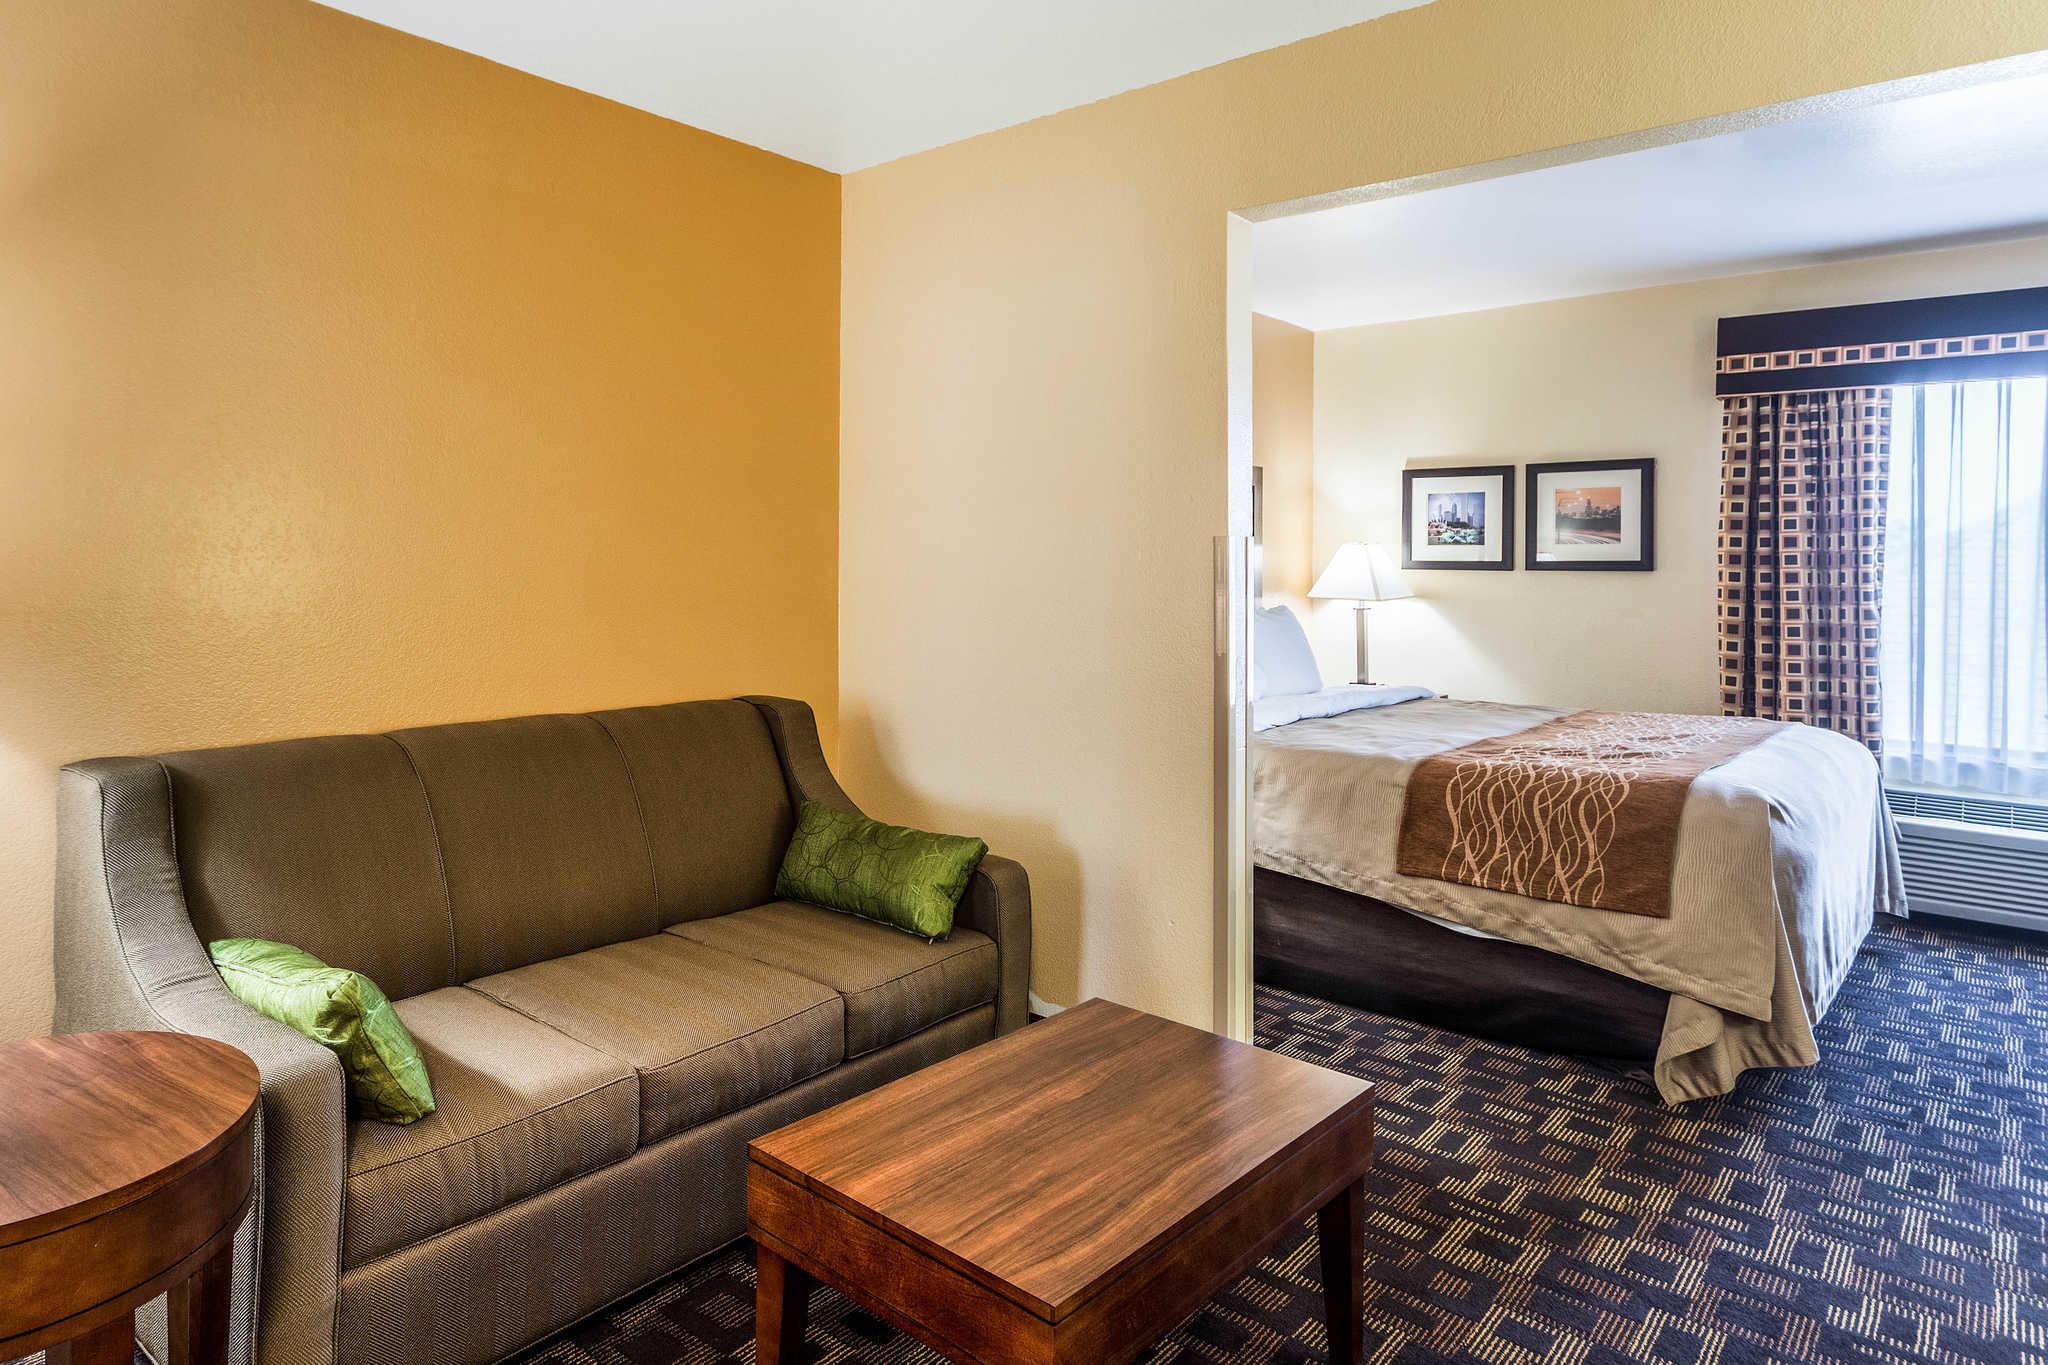 Comfort Inn & Suites North Aurora - Naperville image 22